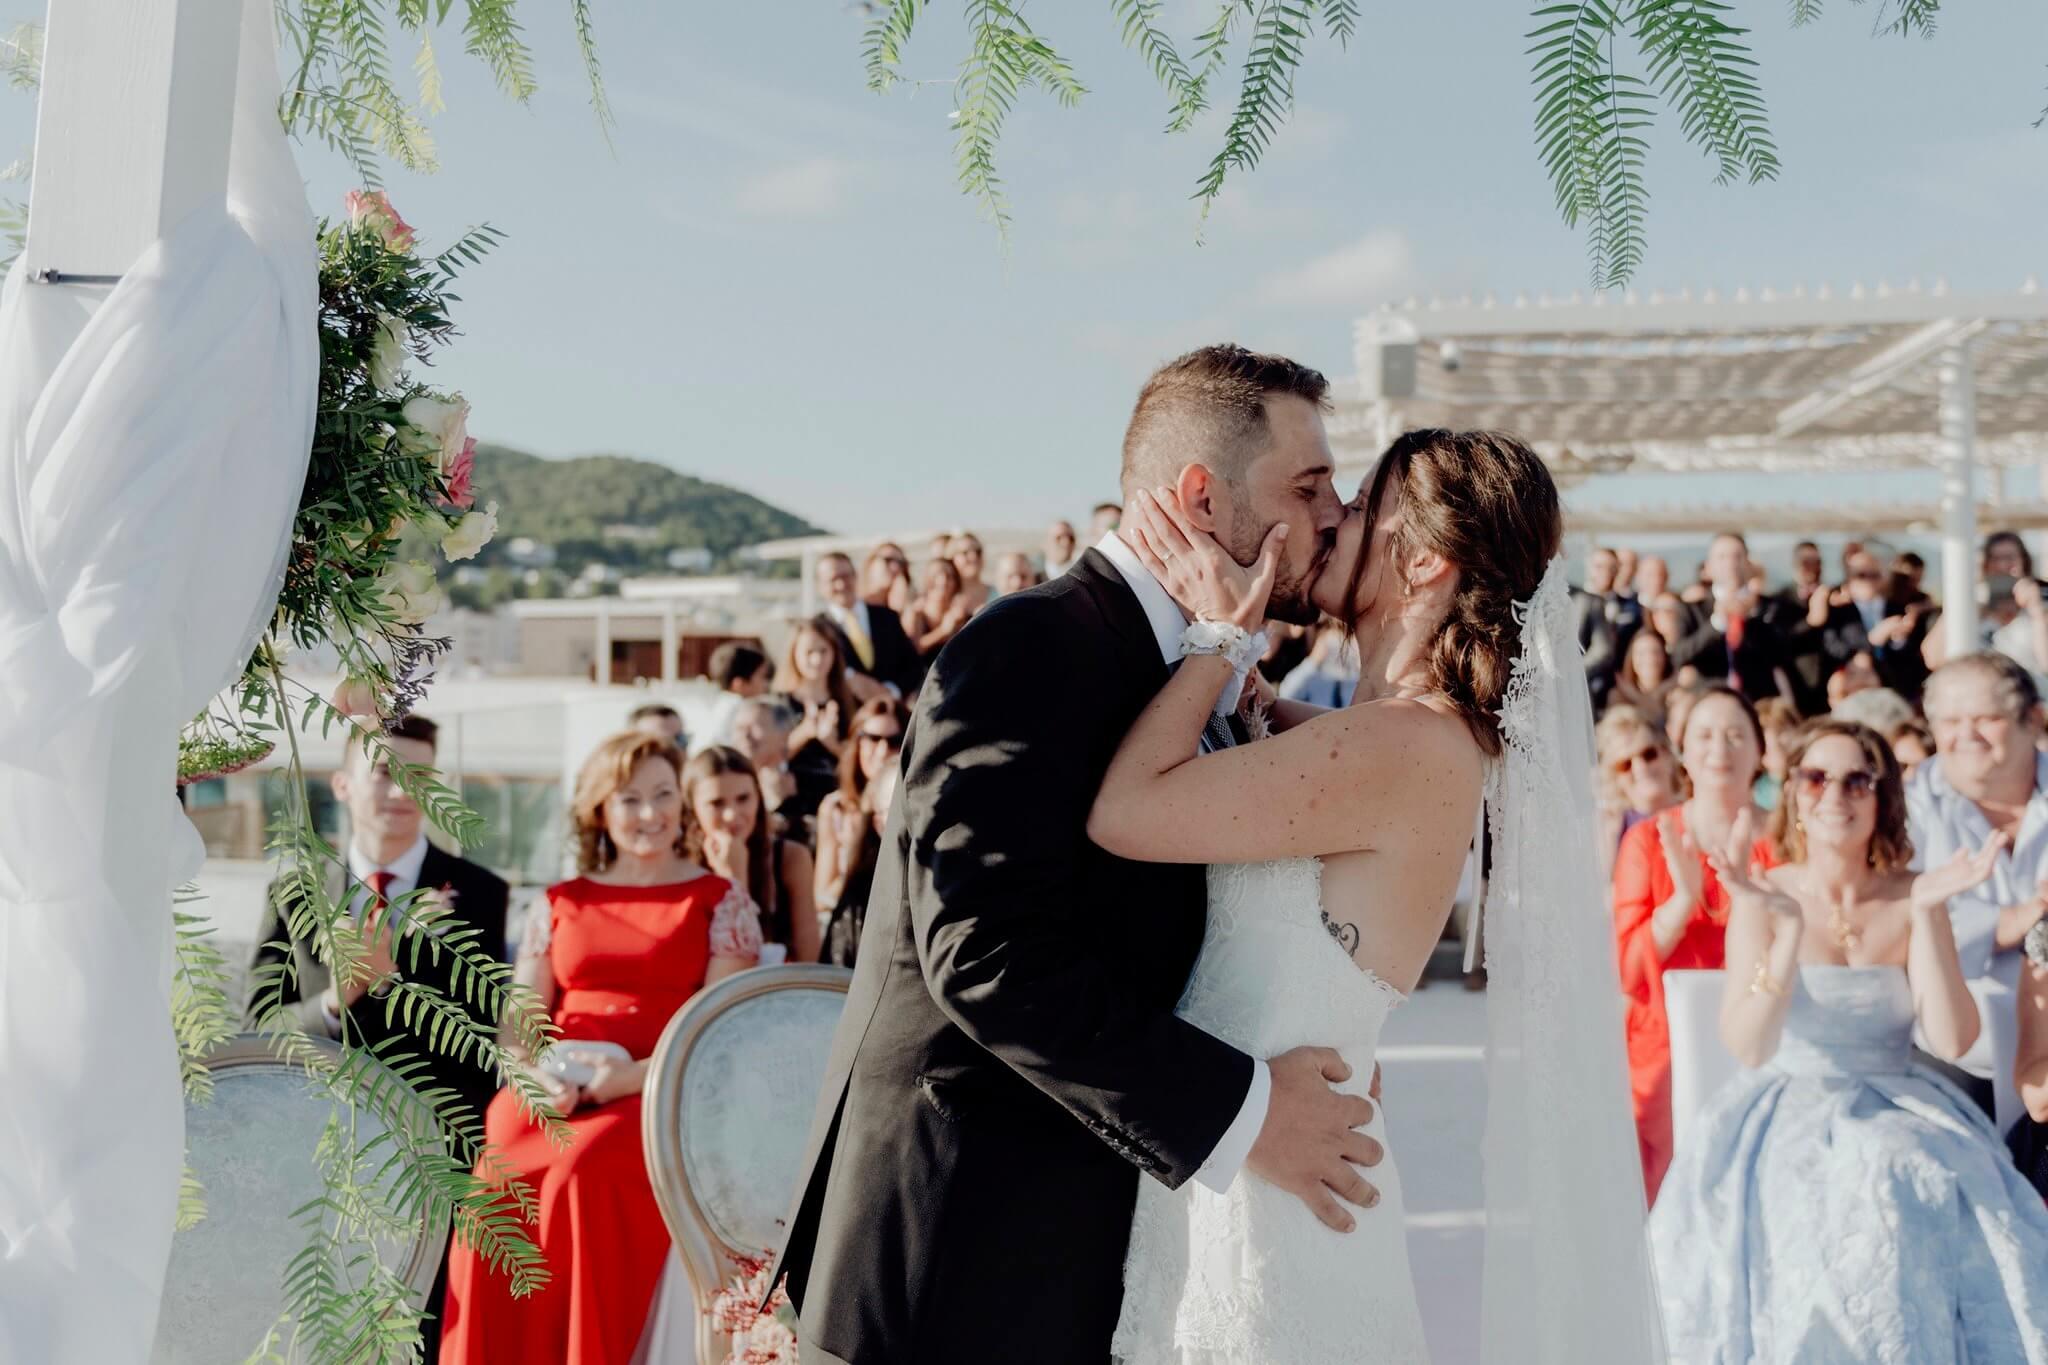 https://www.white-ibiza.com/wp-content/uploads/2020/03/ibiza-weddings-aguas-de-ibiza-2020-04.jpg